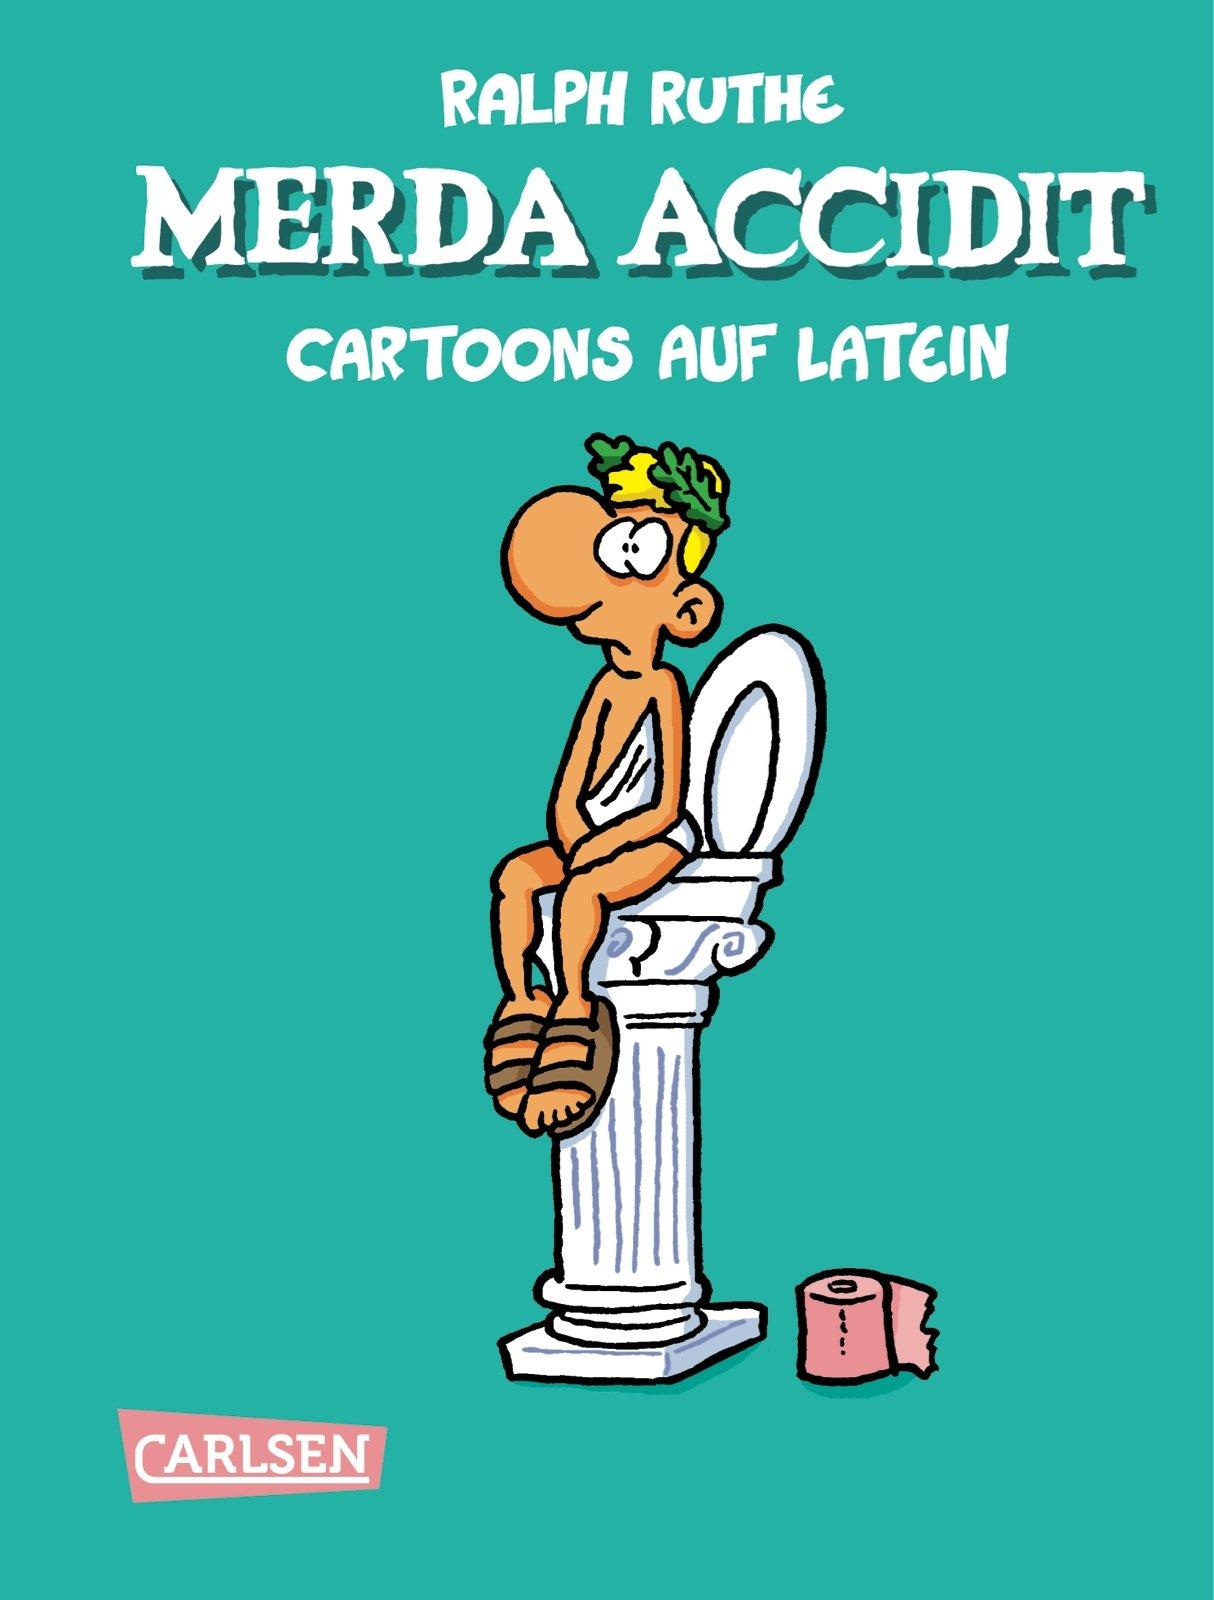 Merda accidit!: Cartoons auf Latein: Amazon.es: Ruthe, Ralph, Ruthe, Ralph: Libros en idiomas extranjeros